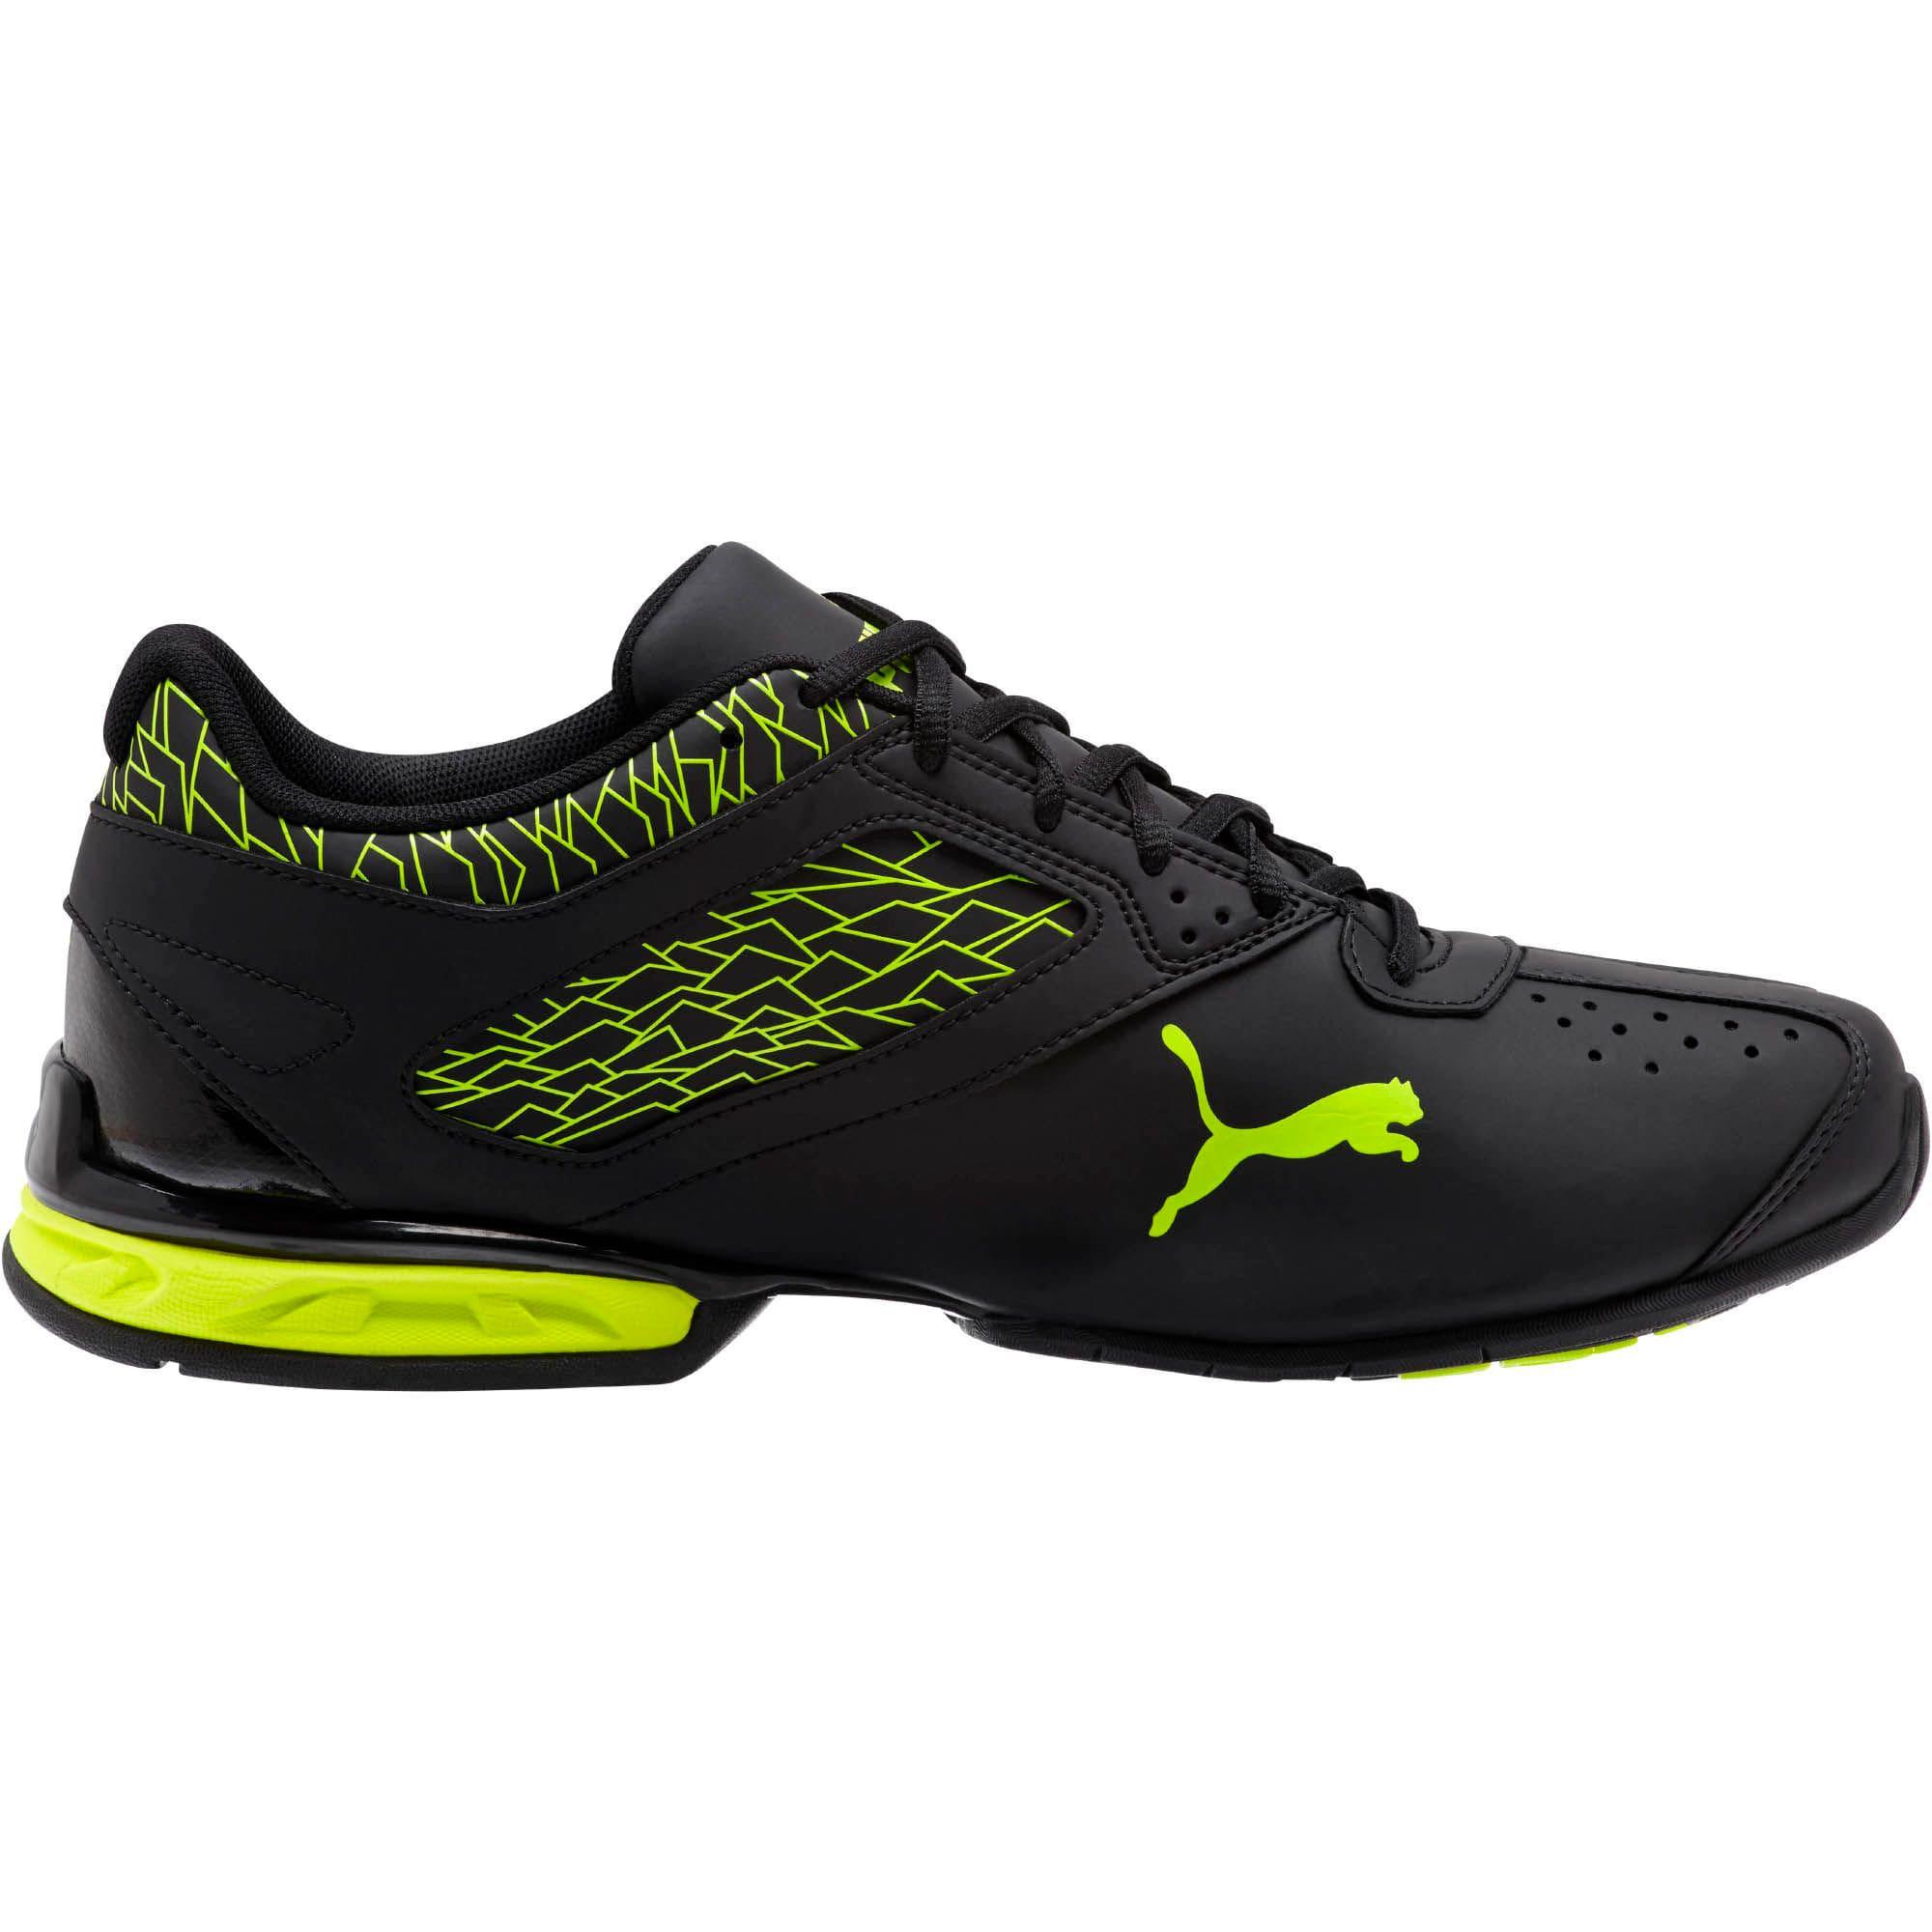 Thumbnail 3 of Tazon 6 Fracture FM Men's Sneakers, Puma Black-Safety Yellow, medium